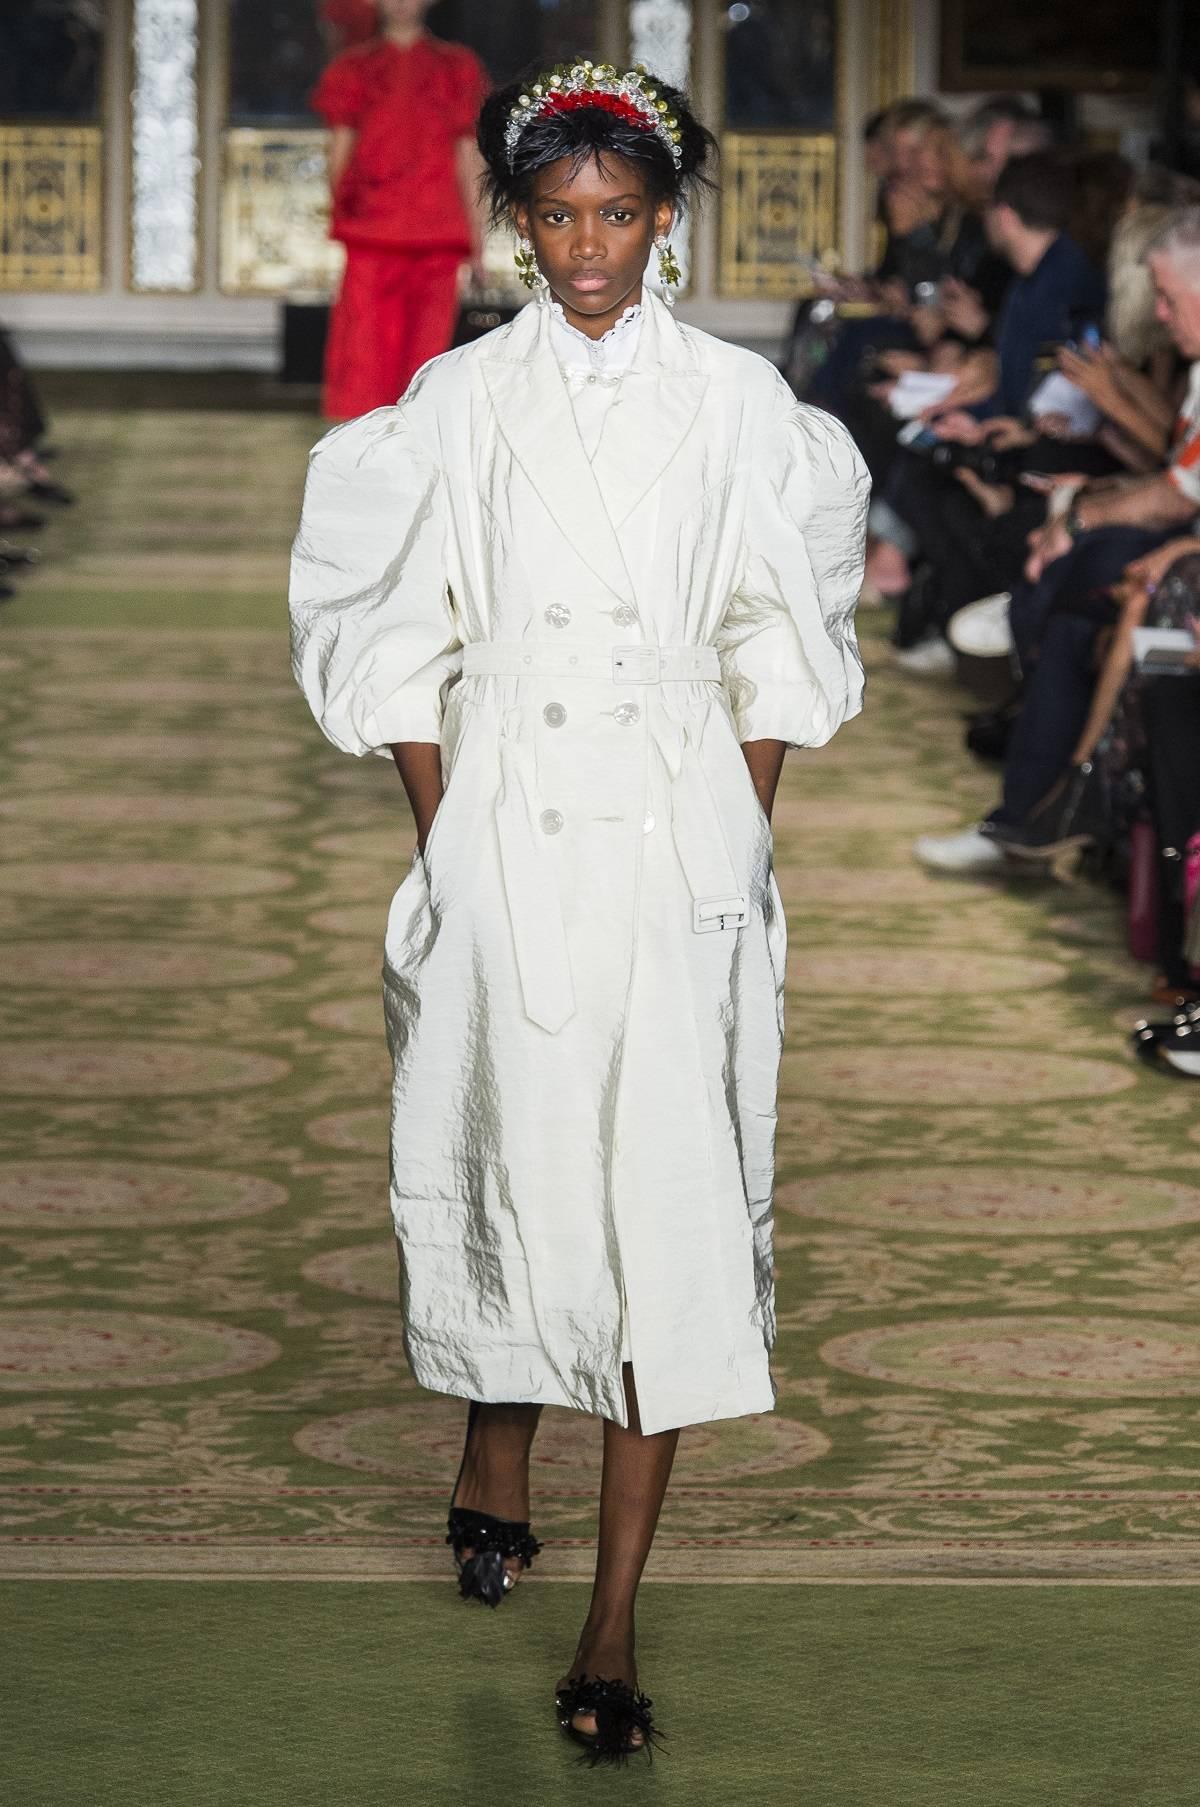 Trendy Wiosna Lato 2019 Moda Z Historią